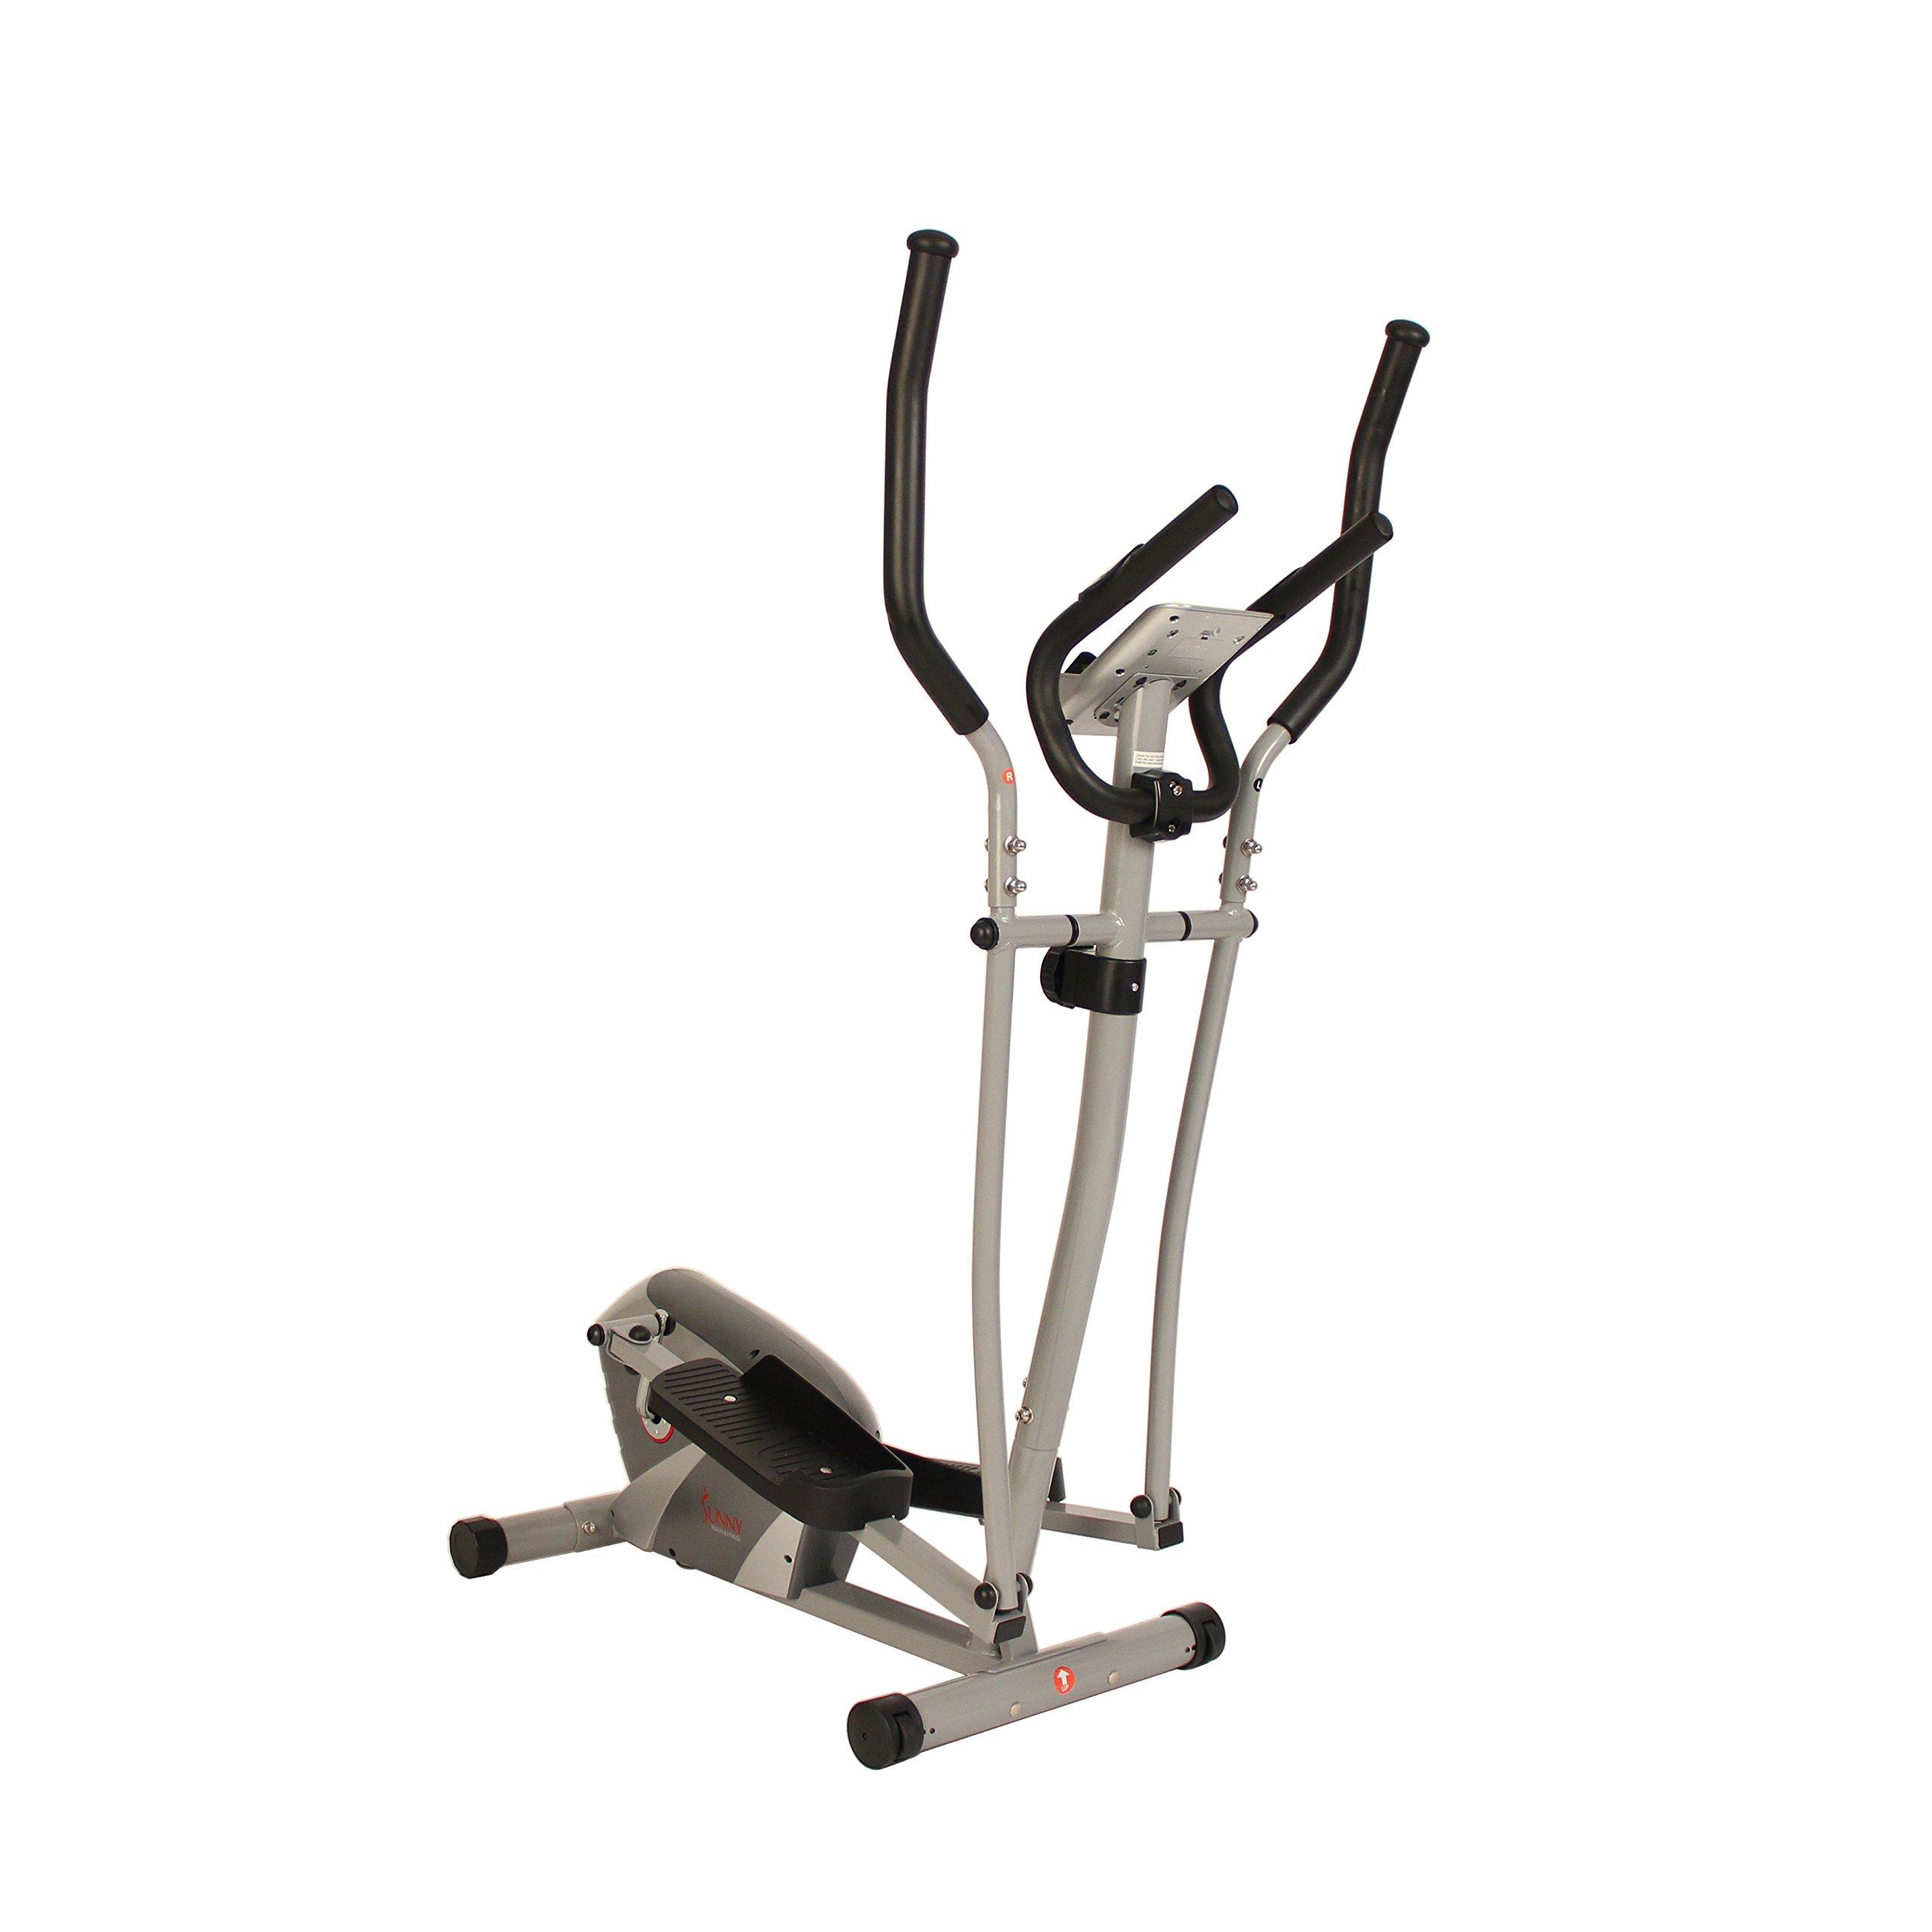 Sunny Health & Fitness Magnetic Elliptical Trainer by - SF-E3628 Magnetic Elliptical Trainer, Gray